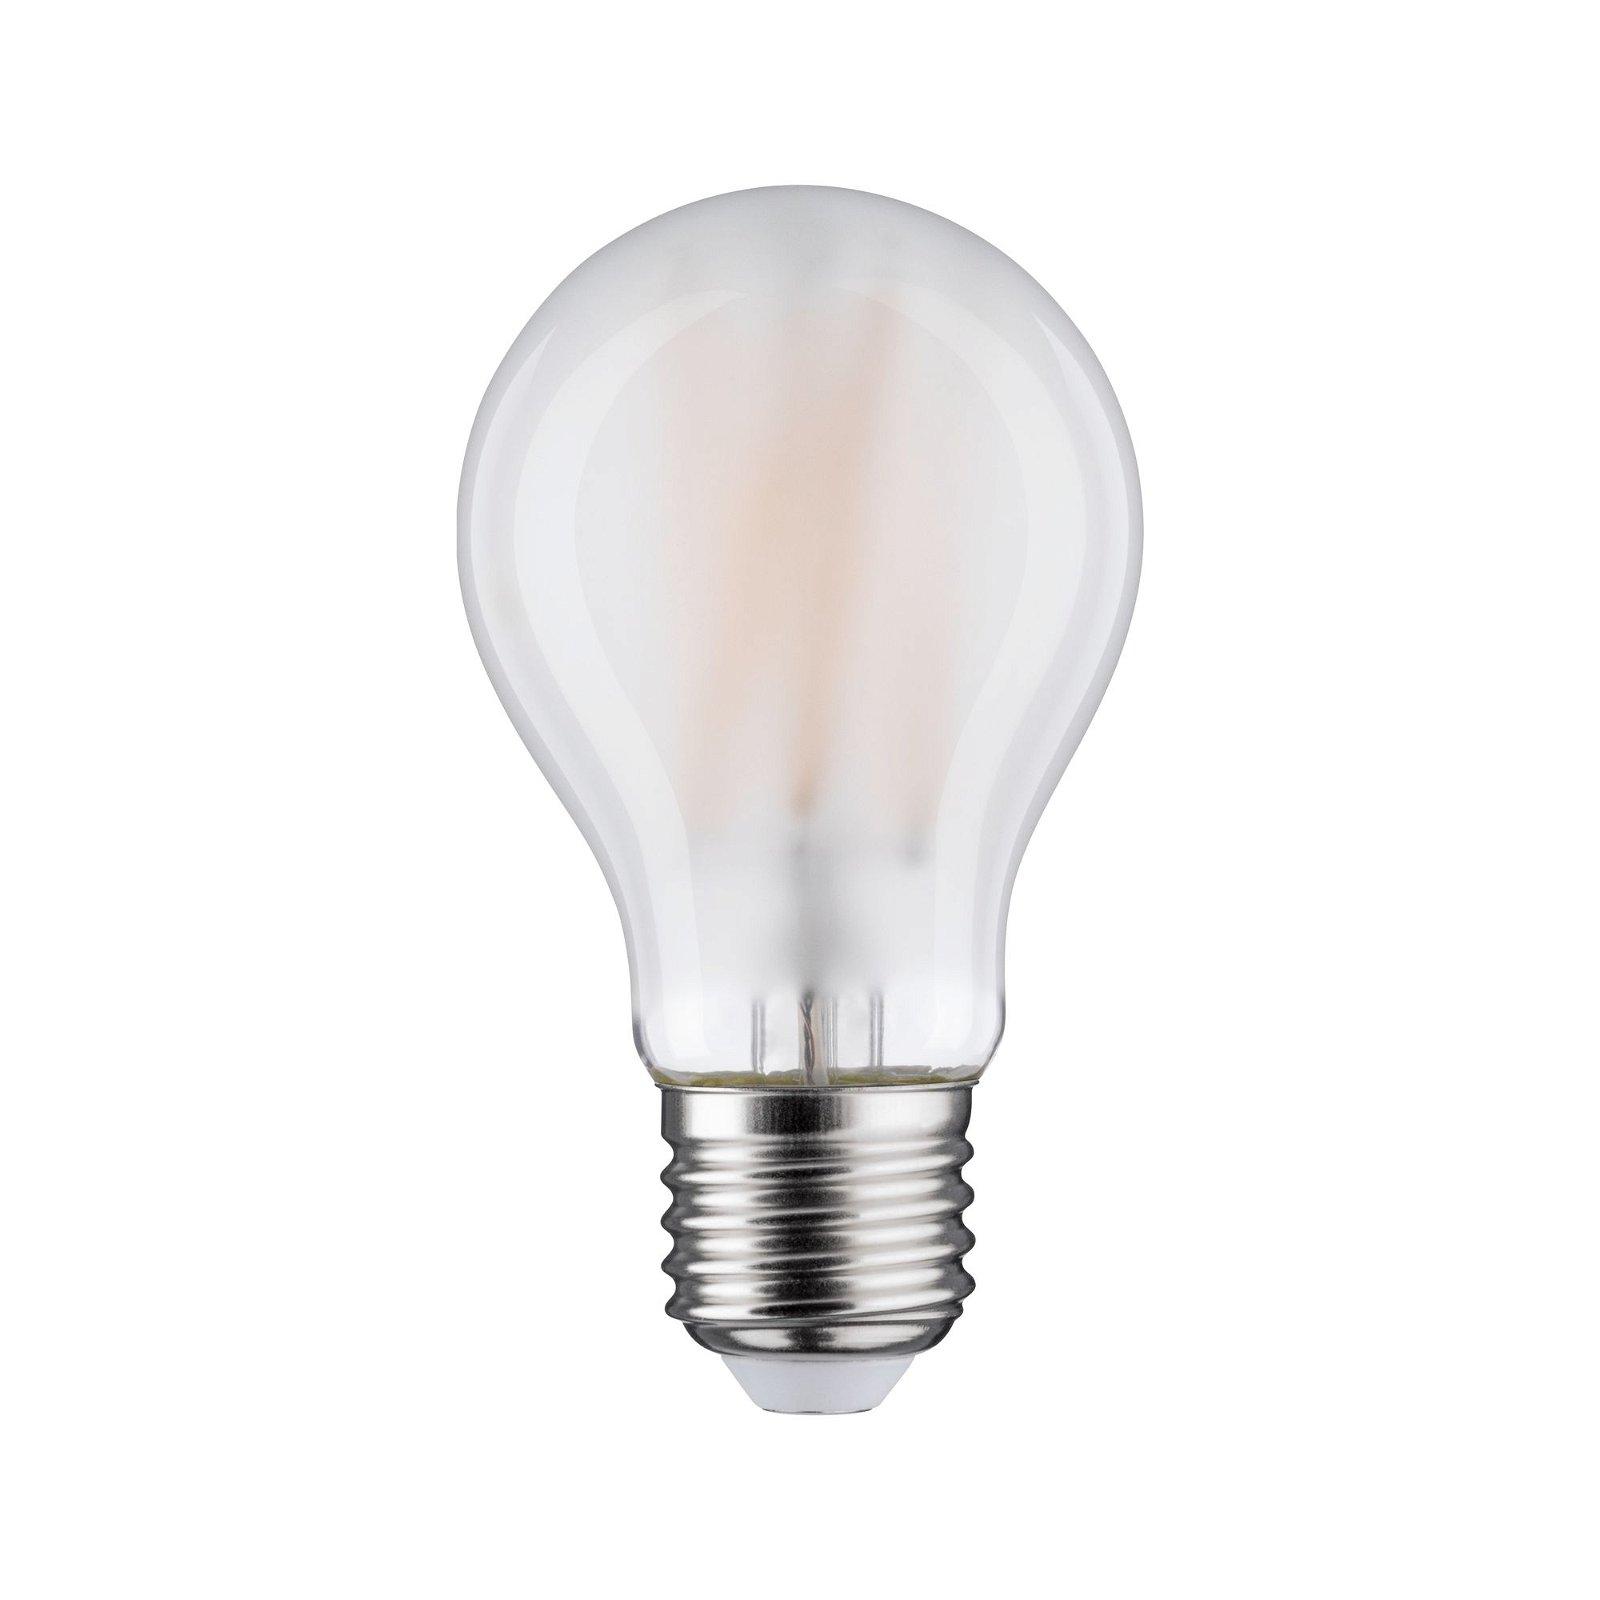 LED Birne Filament E27 230V 1055lm 9W 2700K Matt